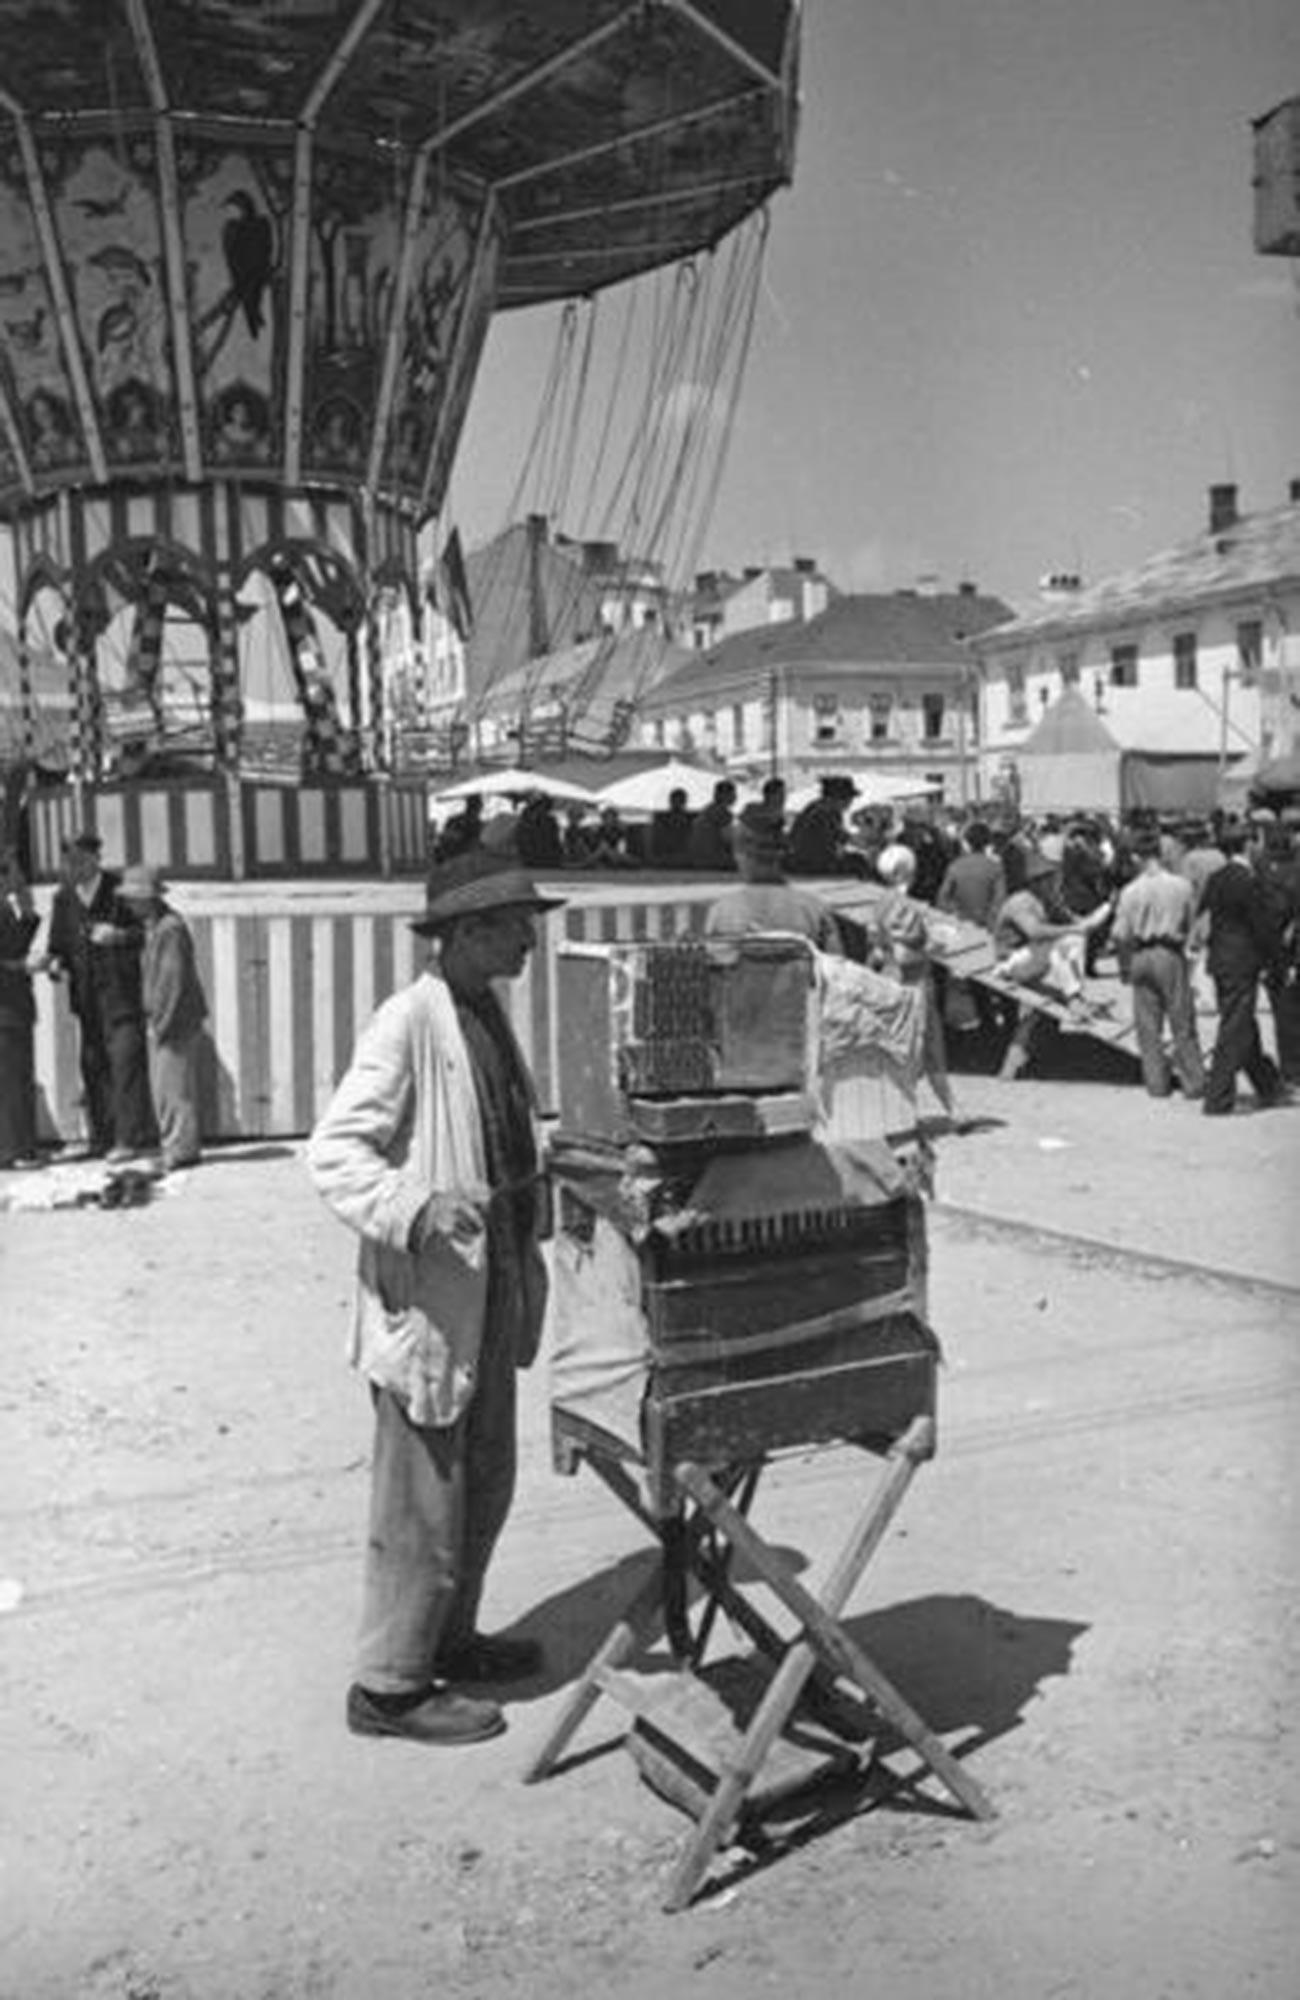 Lajnar s papigo v mestu Černivci, 1940